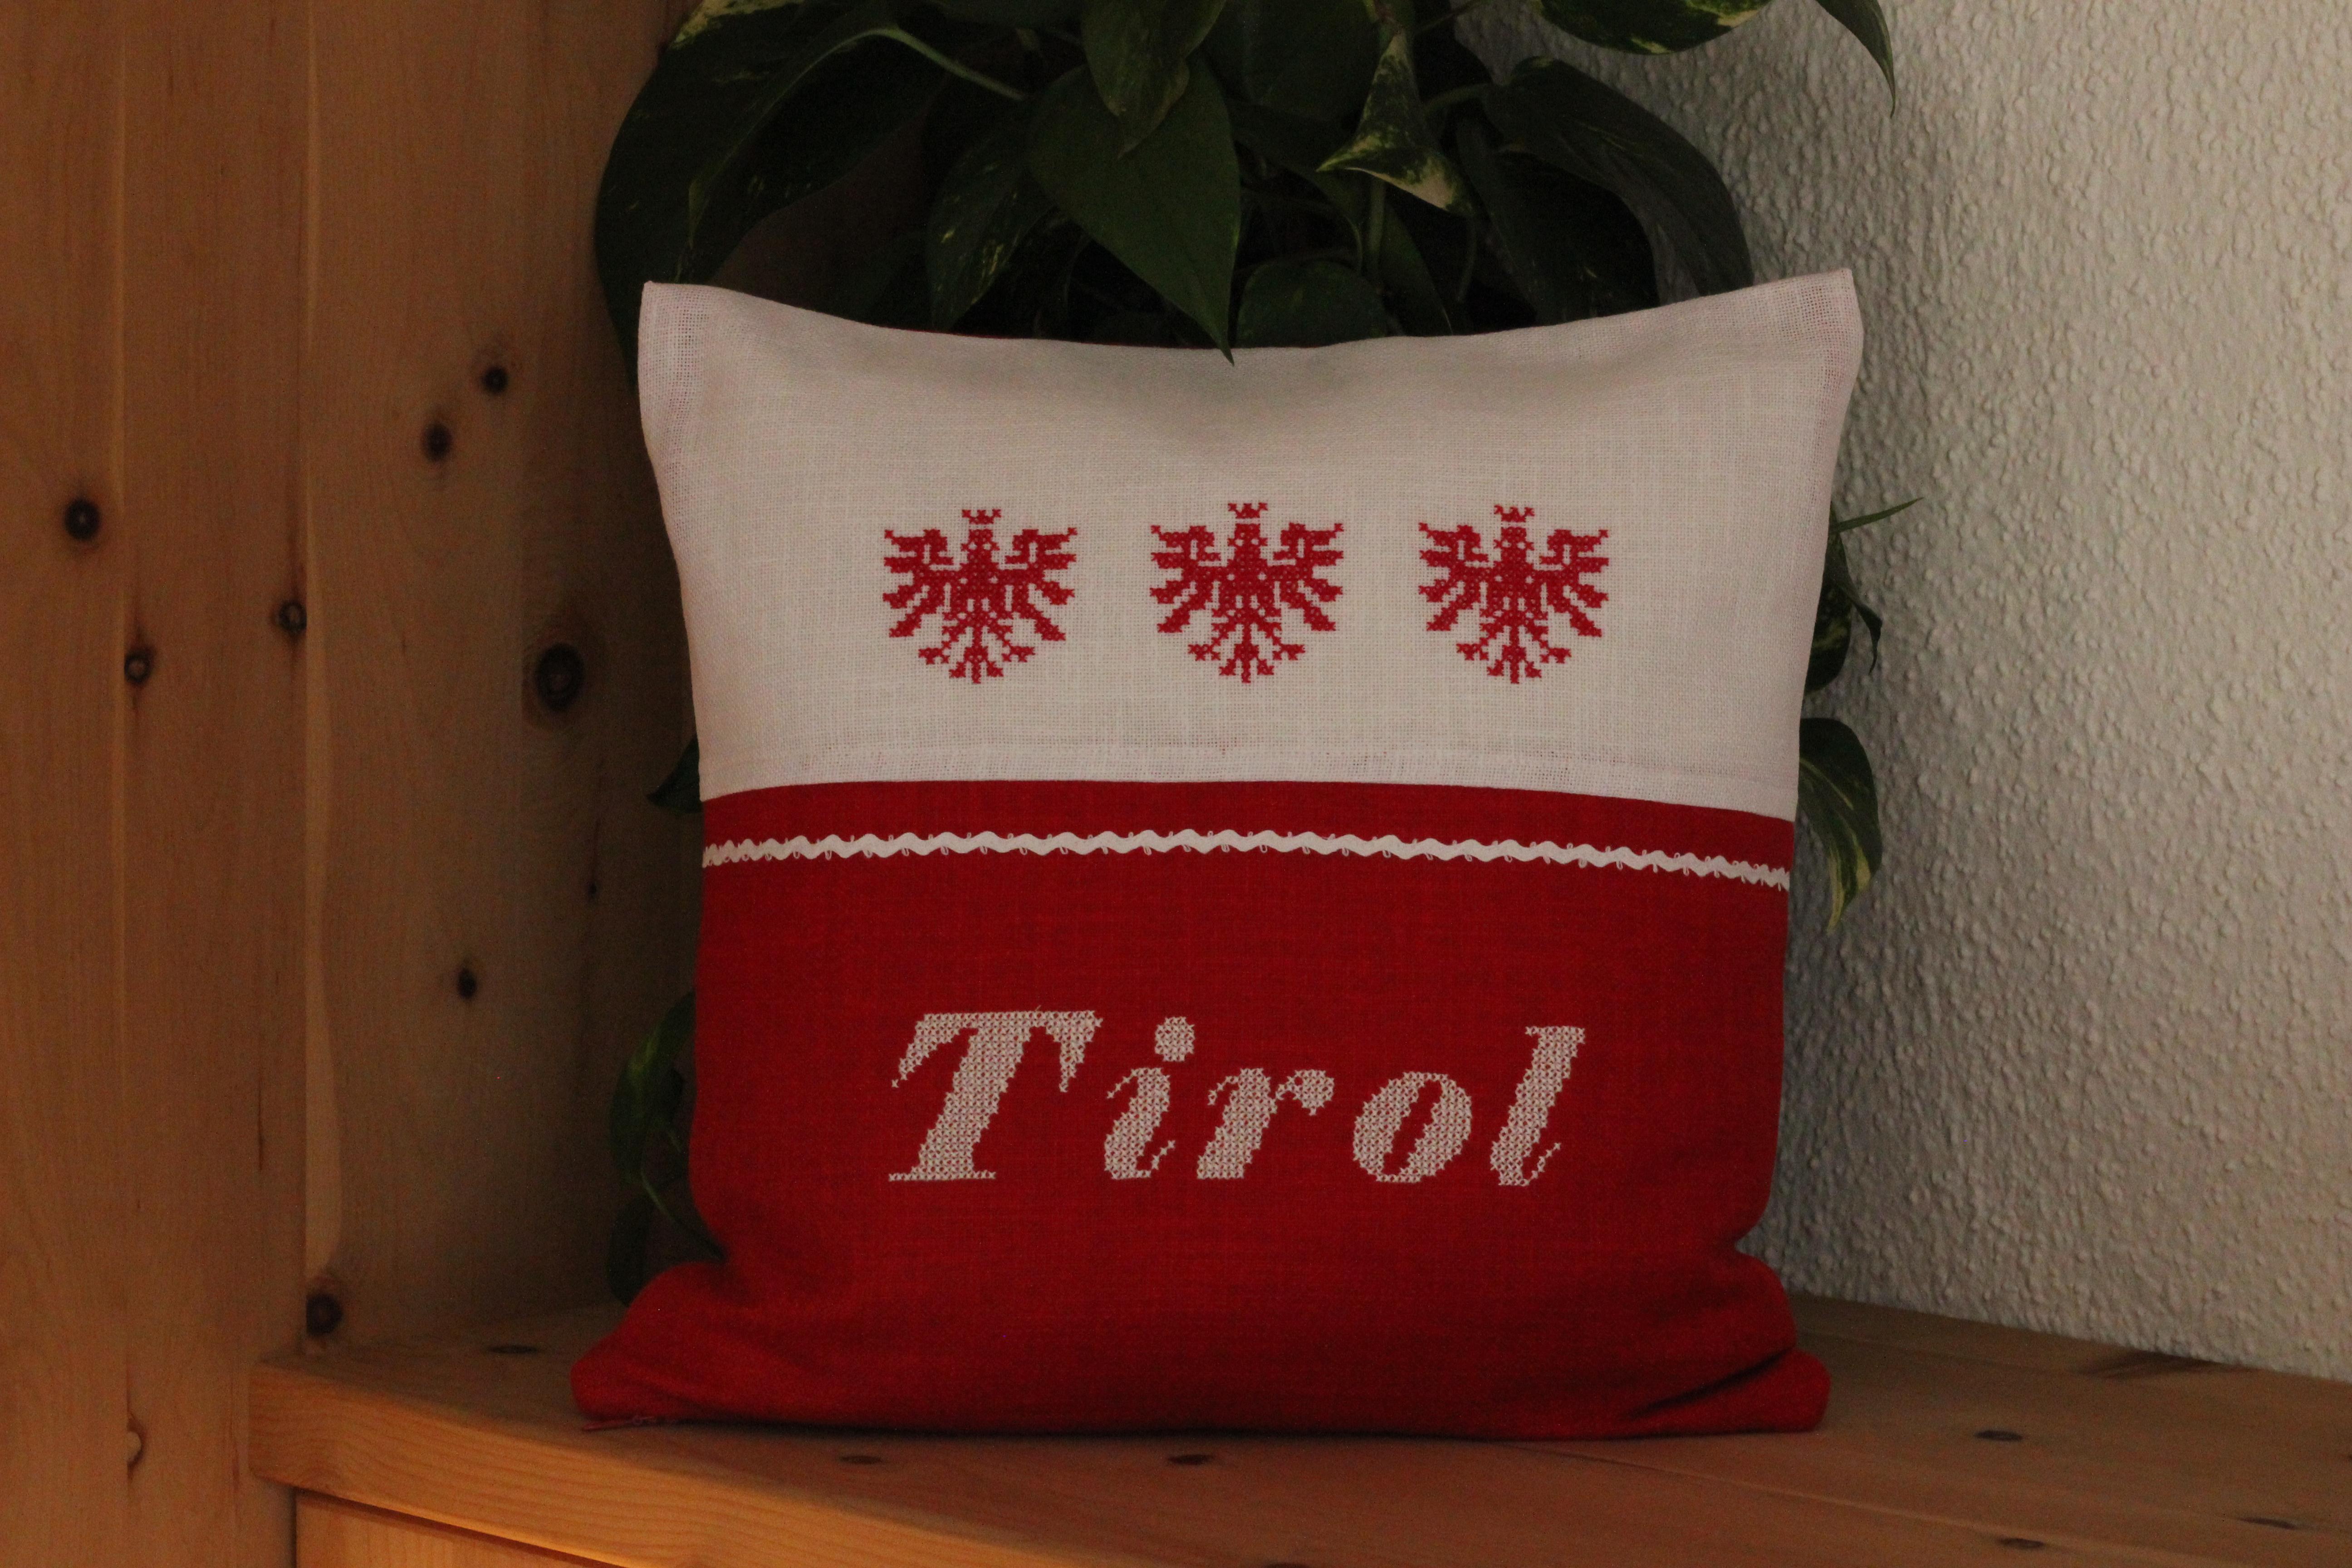 Adler mit Schriftzug Tirol